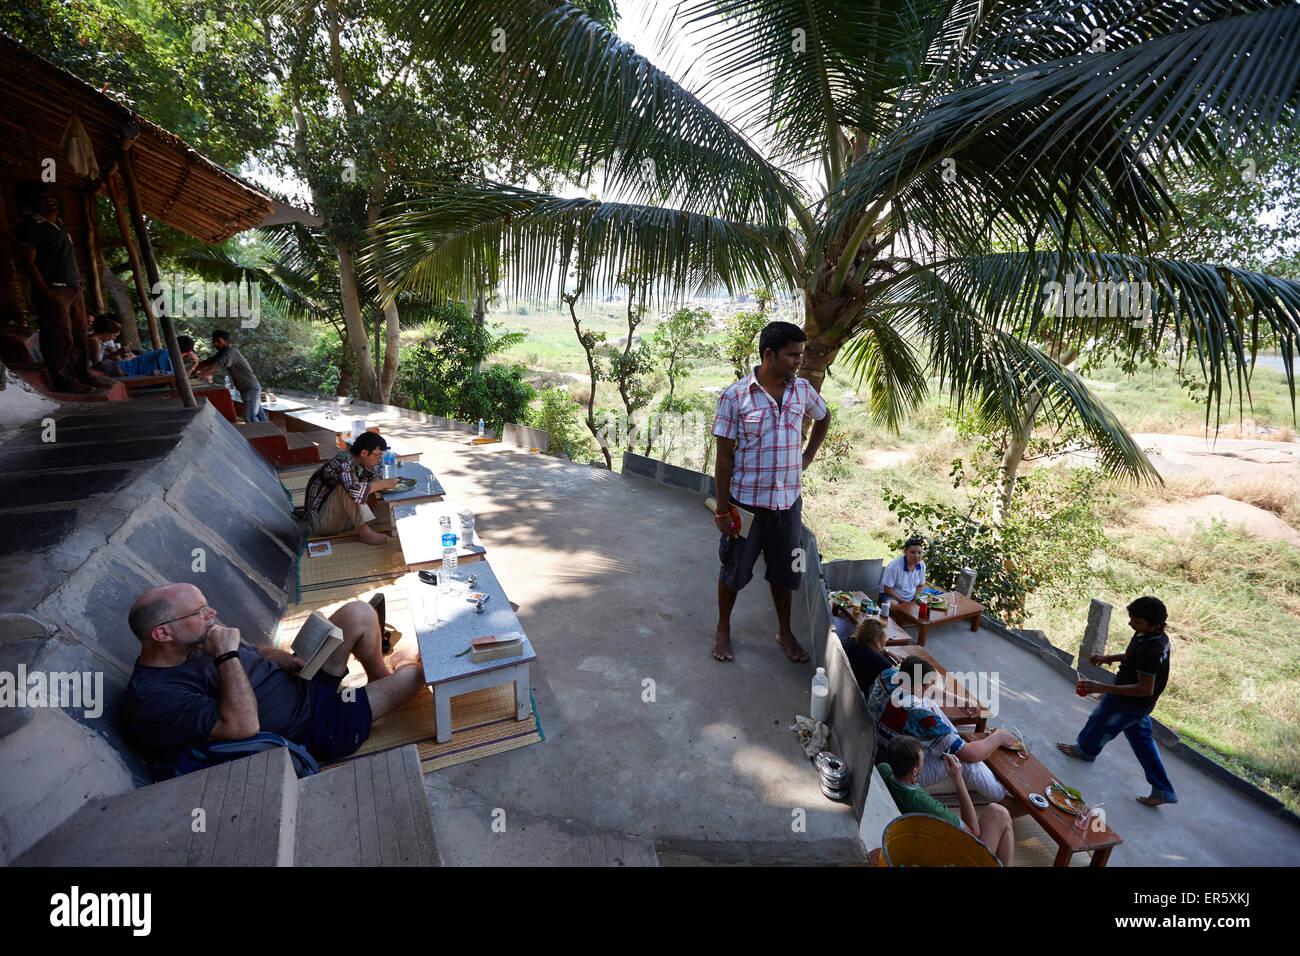 Guests on terrace of a restaurant, Tungabhadra river, Hampi, Karnataka, India - Stock Image